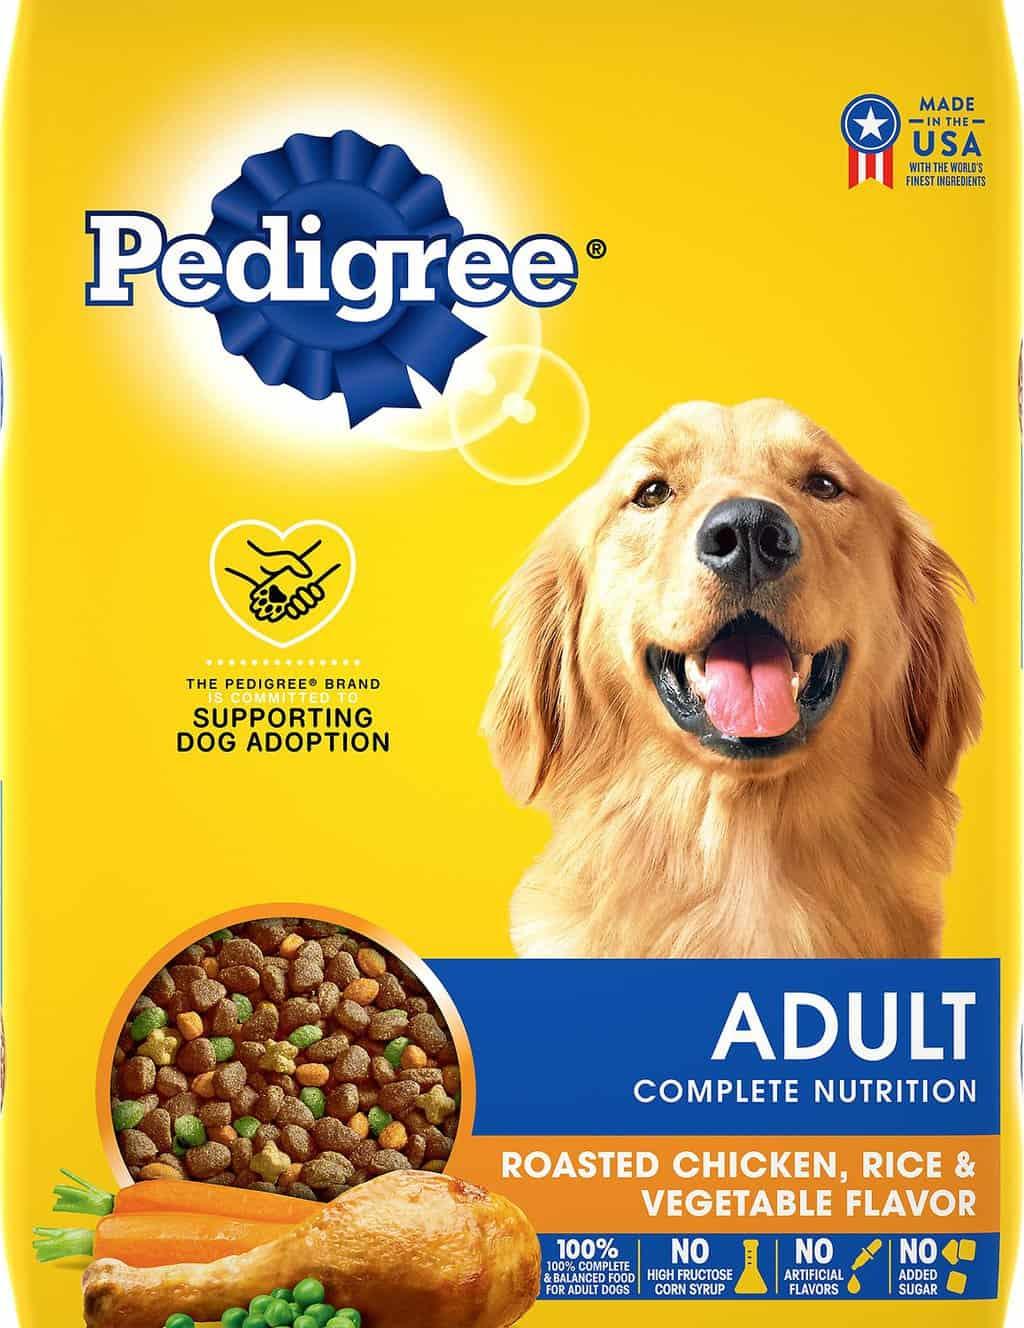 Pedigree Dog Food: [year] Reviews, Recalls & Coupons 11